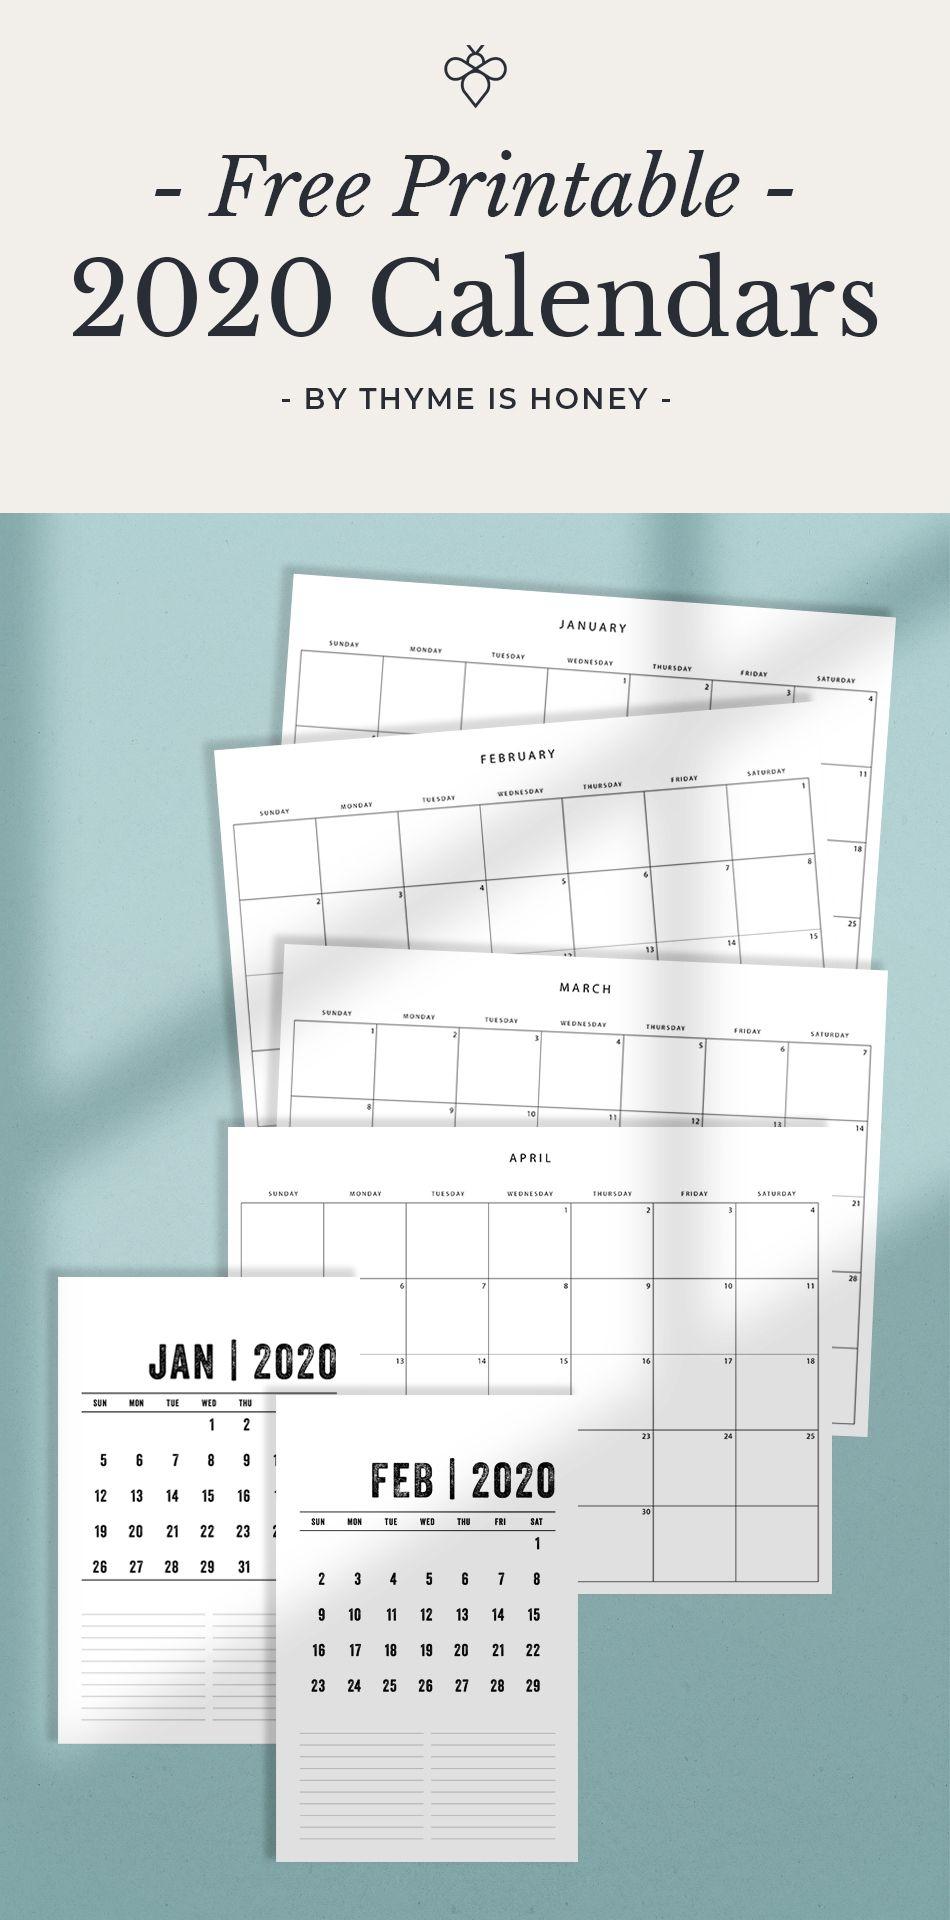 Free 2020 Calendars Thyme Is Honey